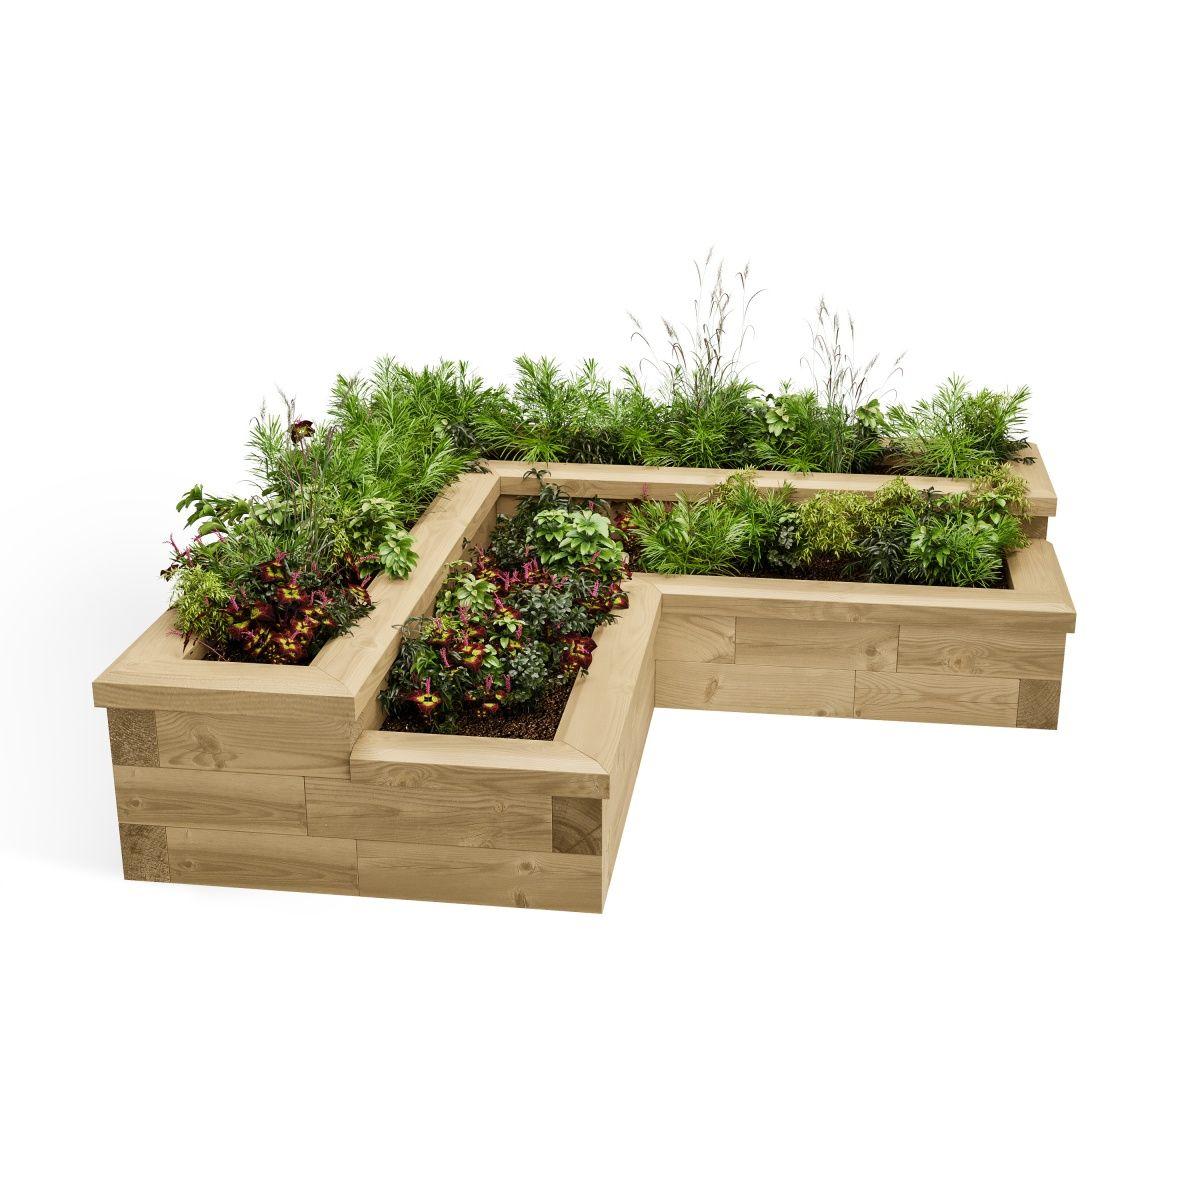 Corner Herb Garden 1 5 X 0 75 X 0 35m Erhohte Gartenbeete Erhohte Beete Gartenliege